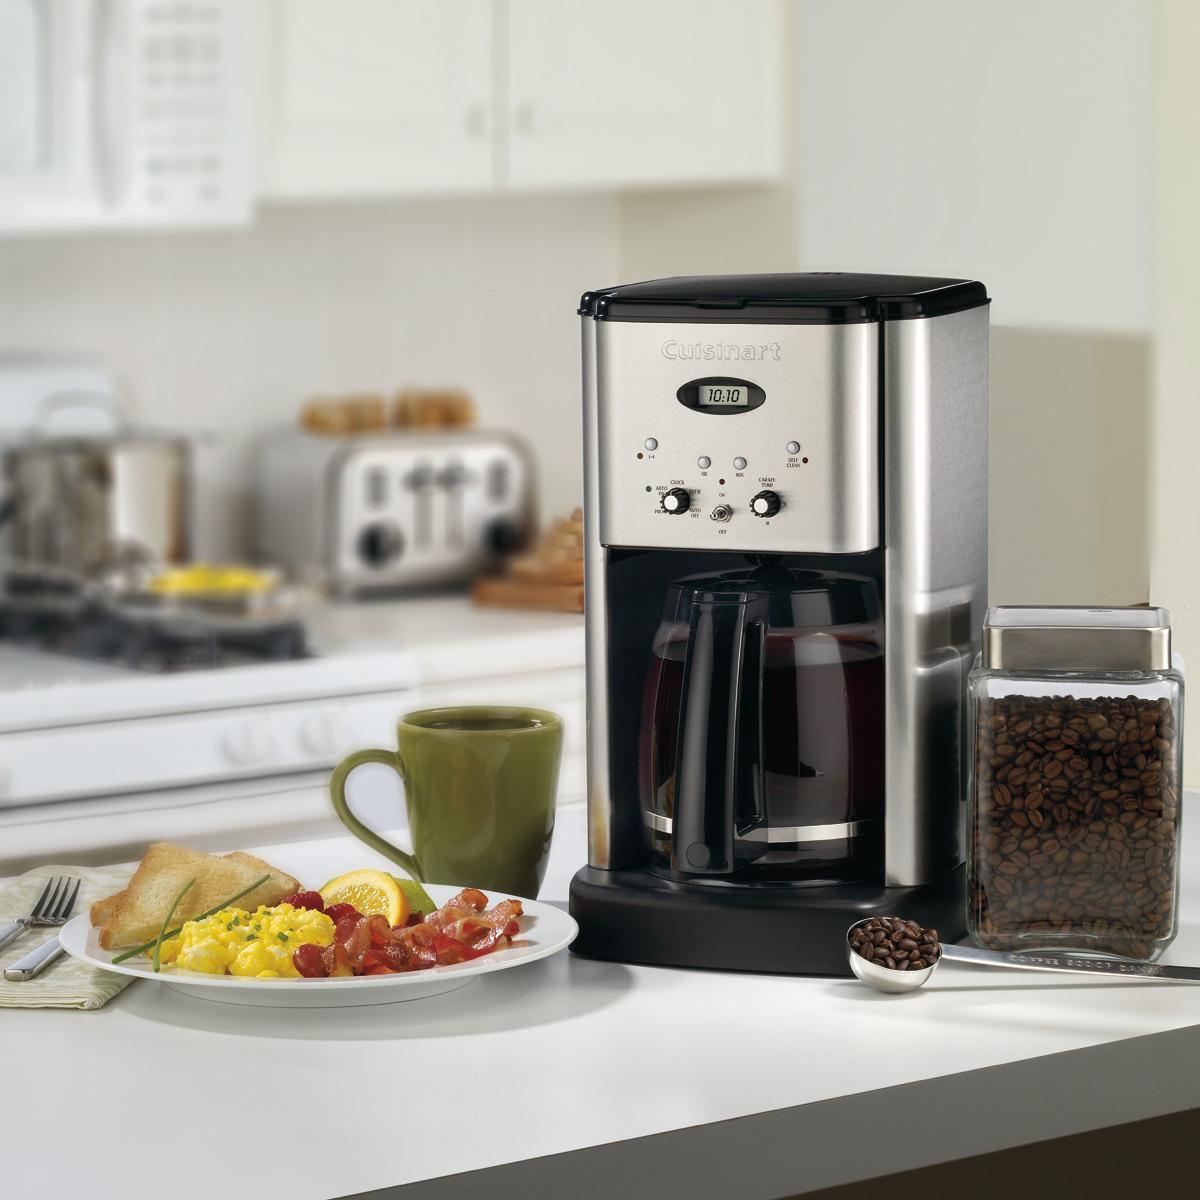 cafeti re programmable brew central de 12 tasses cuisinart. Black Bedroom Furniture Sets. Home Design Ideas